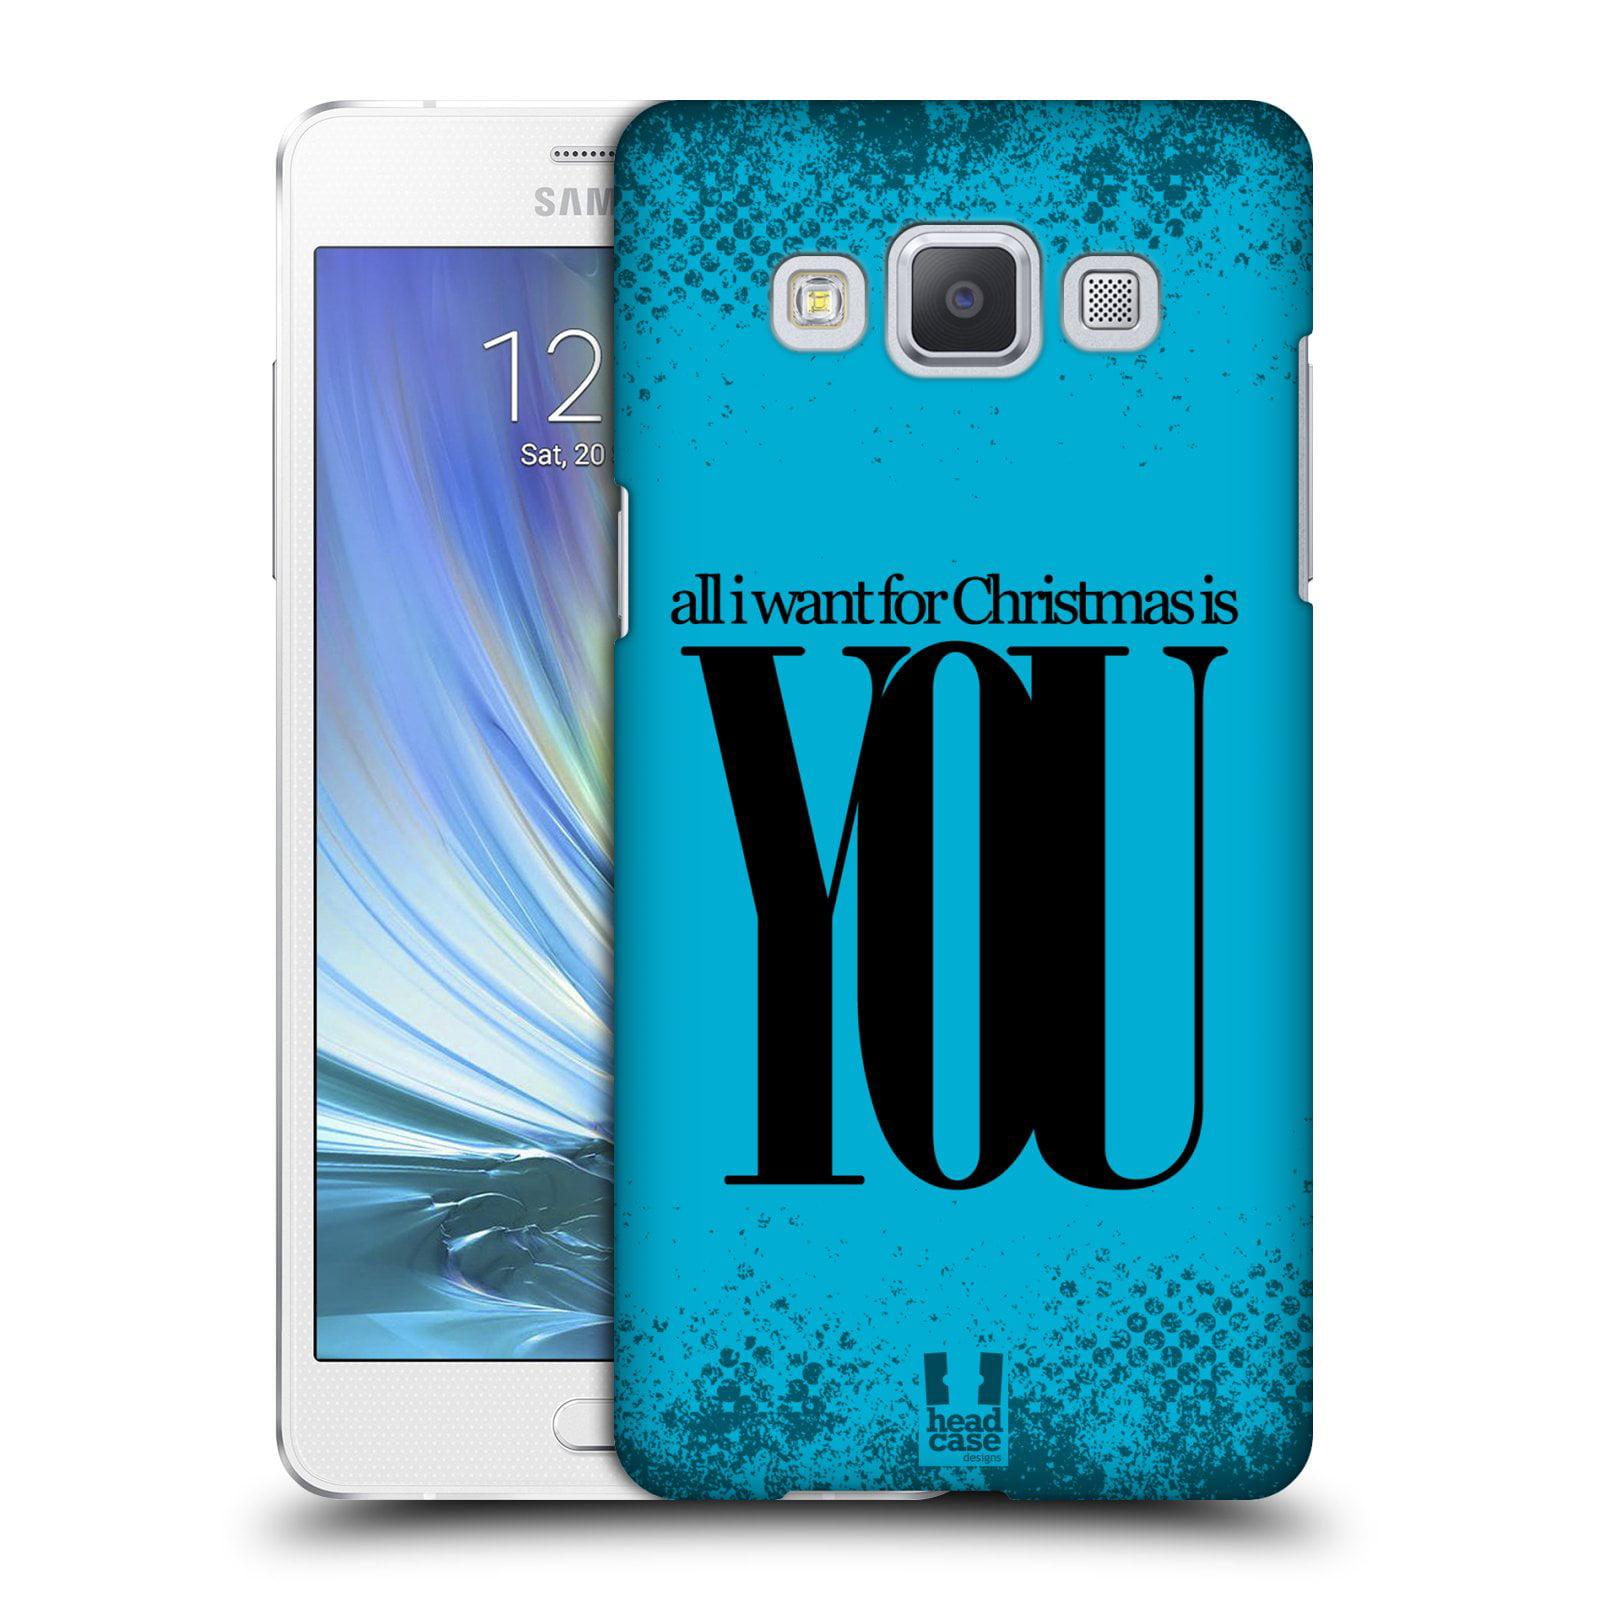 HEAD CASE DESIGNS CHRISTMAS STATEMENTS HARD BACK CASE FOR SAMSUNG PHONES 1